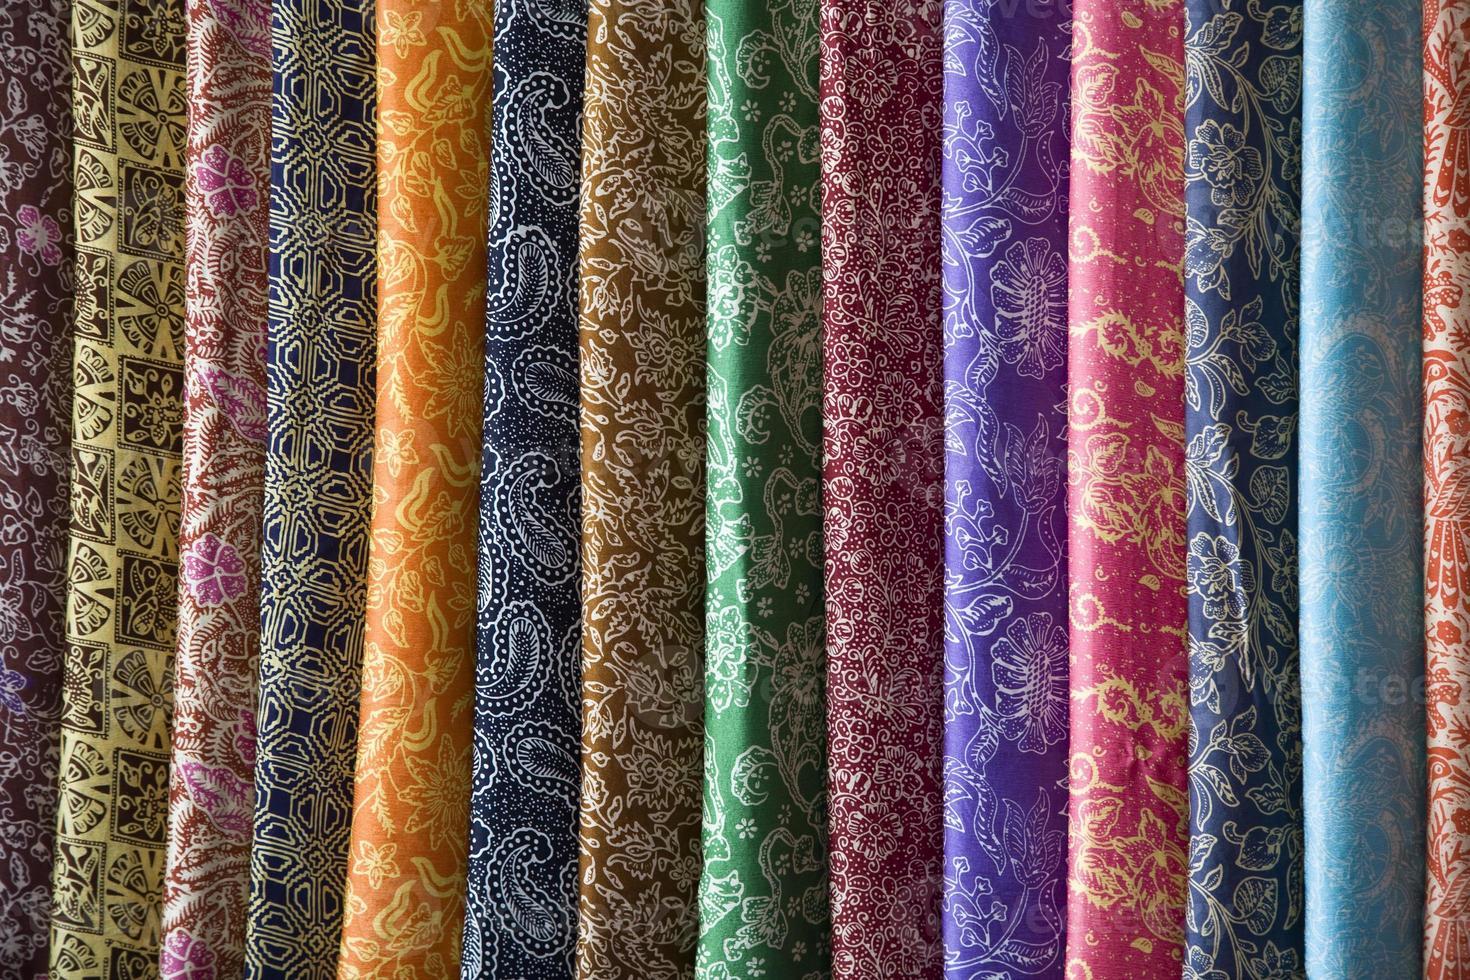 A vibrant selection of Batik sarongs photo